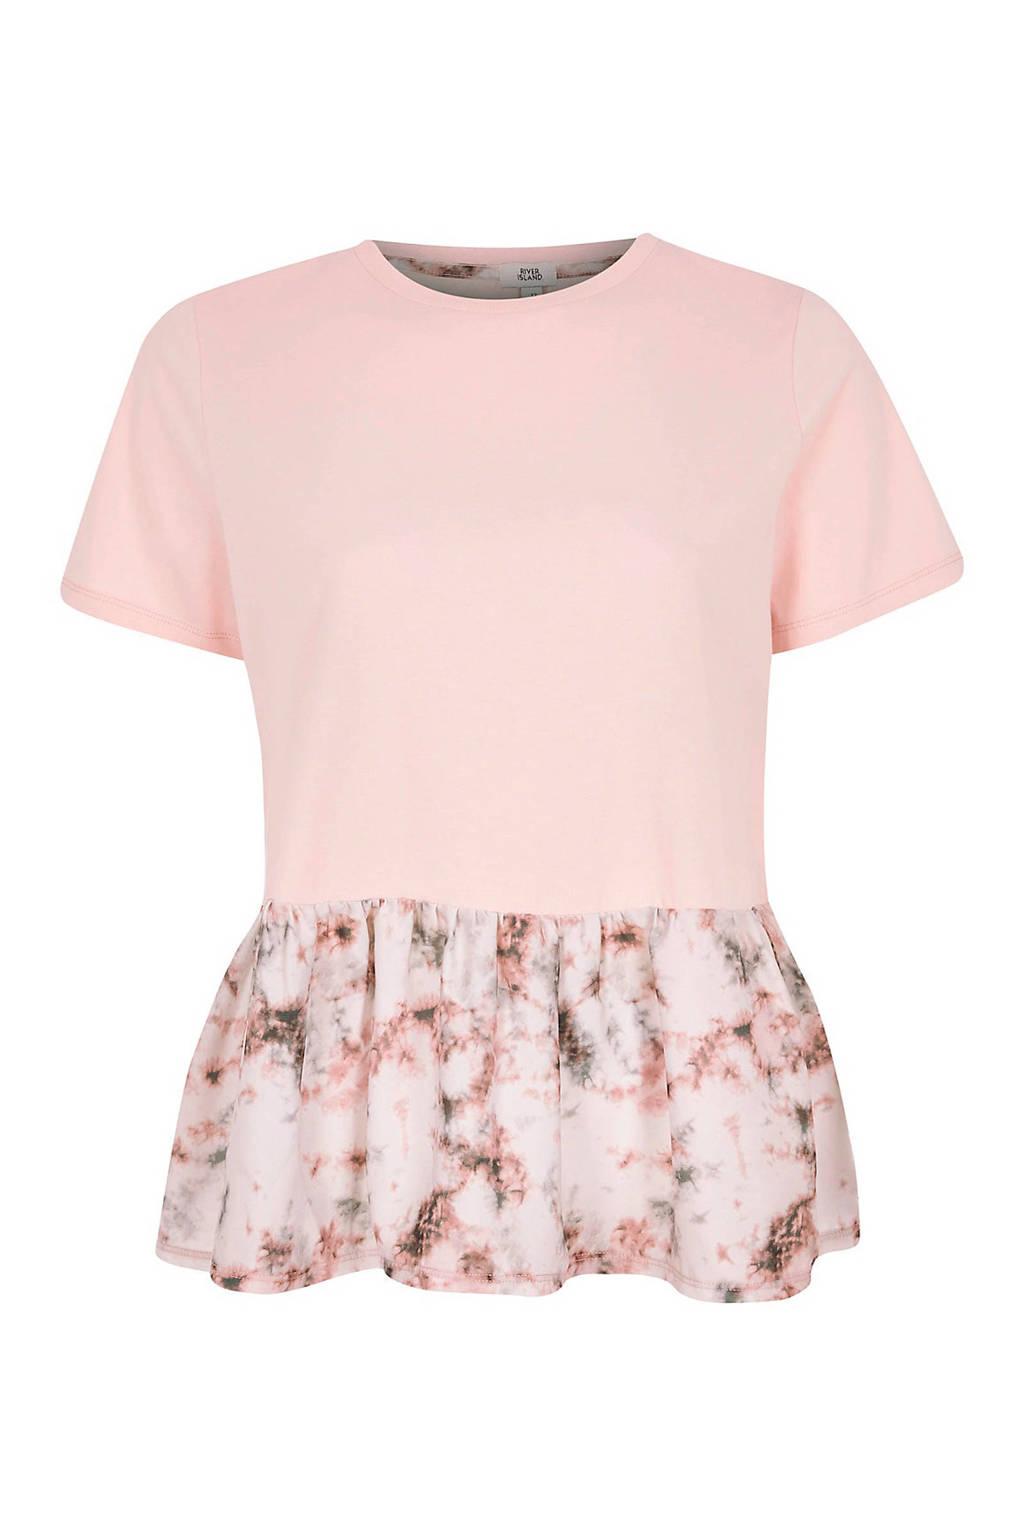 River Island T-shirt met volant roze, Roze